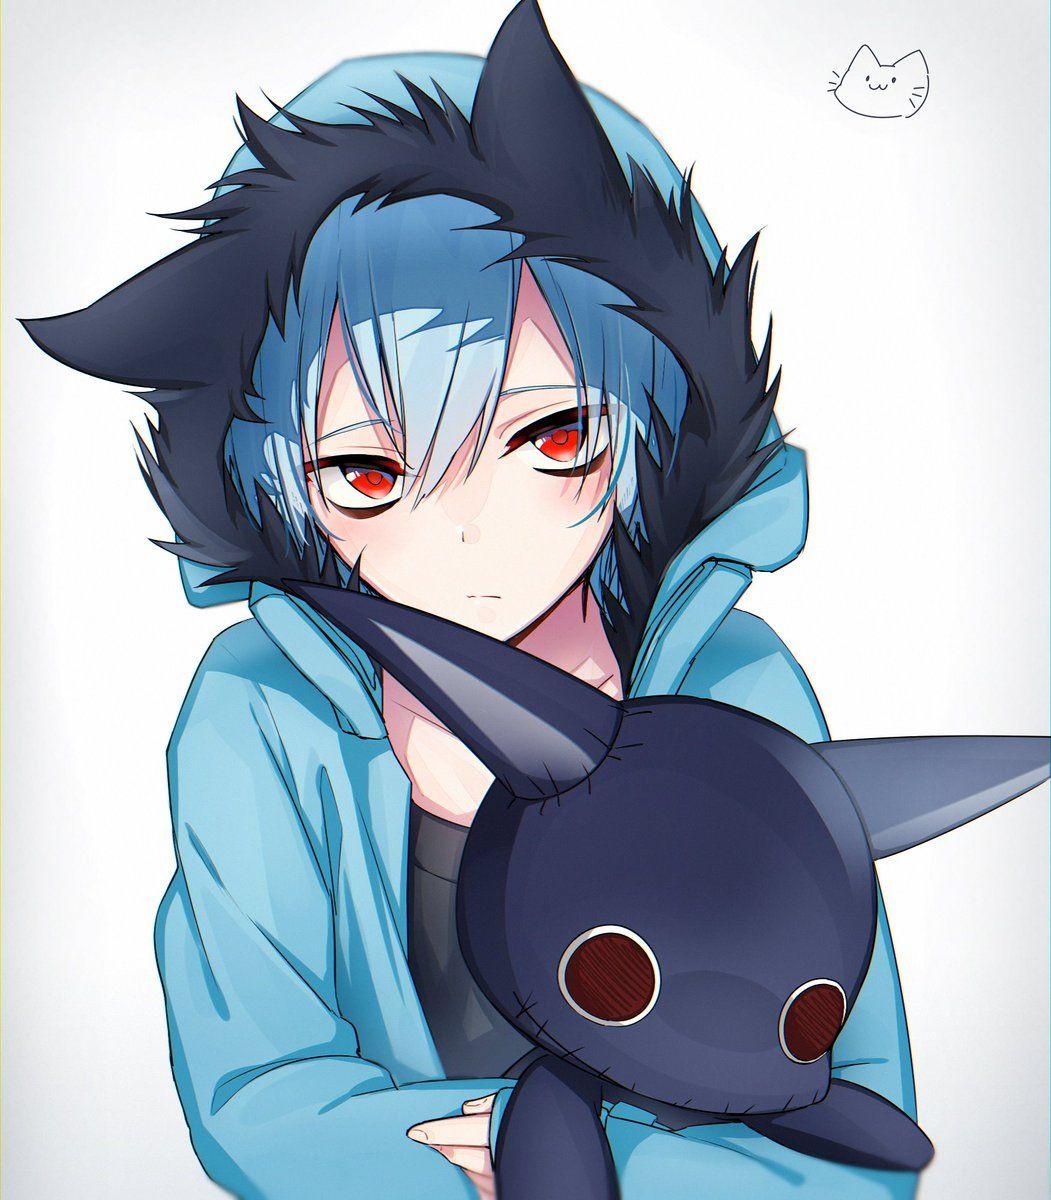 Kuro bambino con il suo peluche dark anime Anime